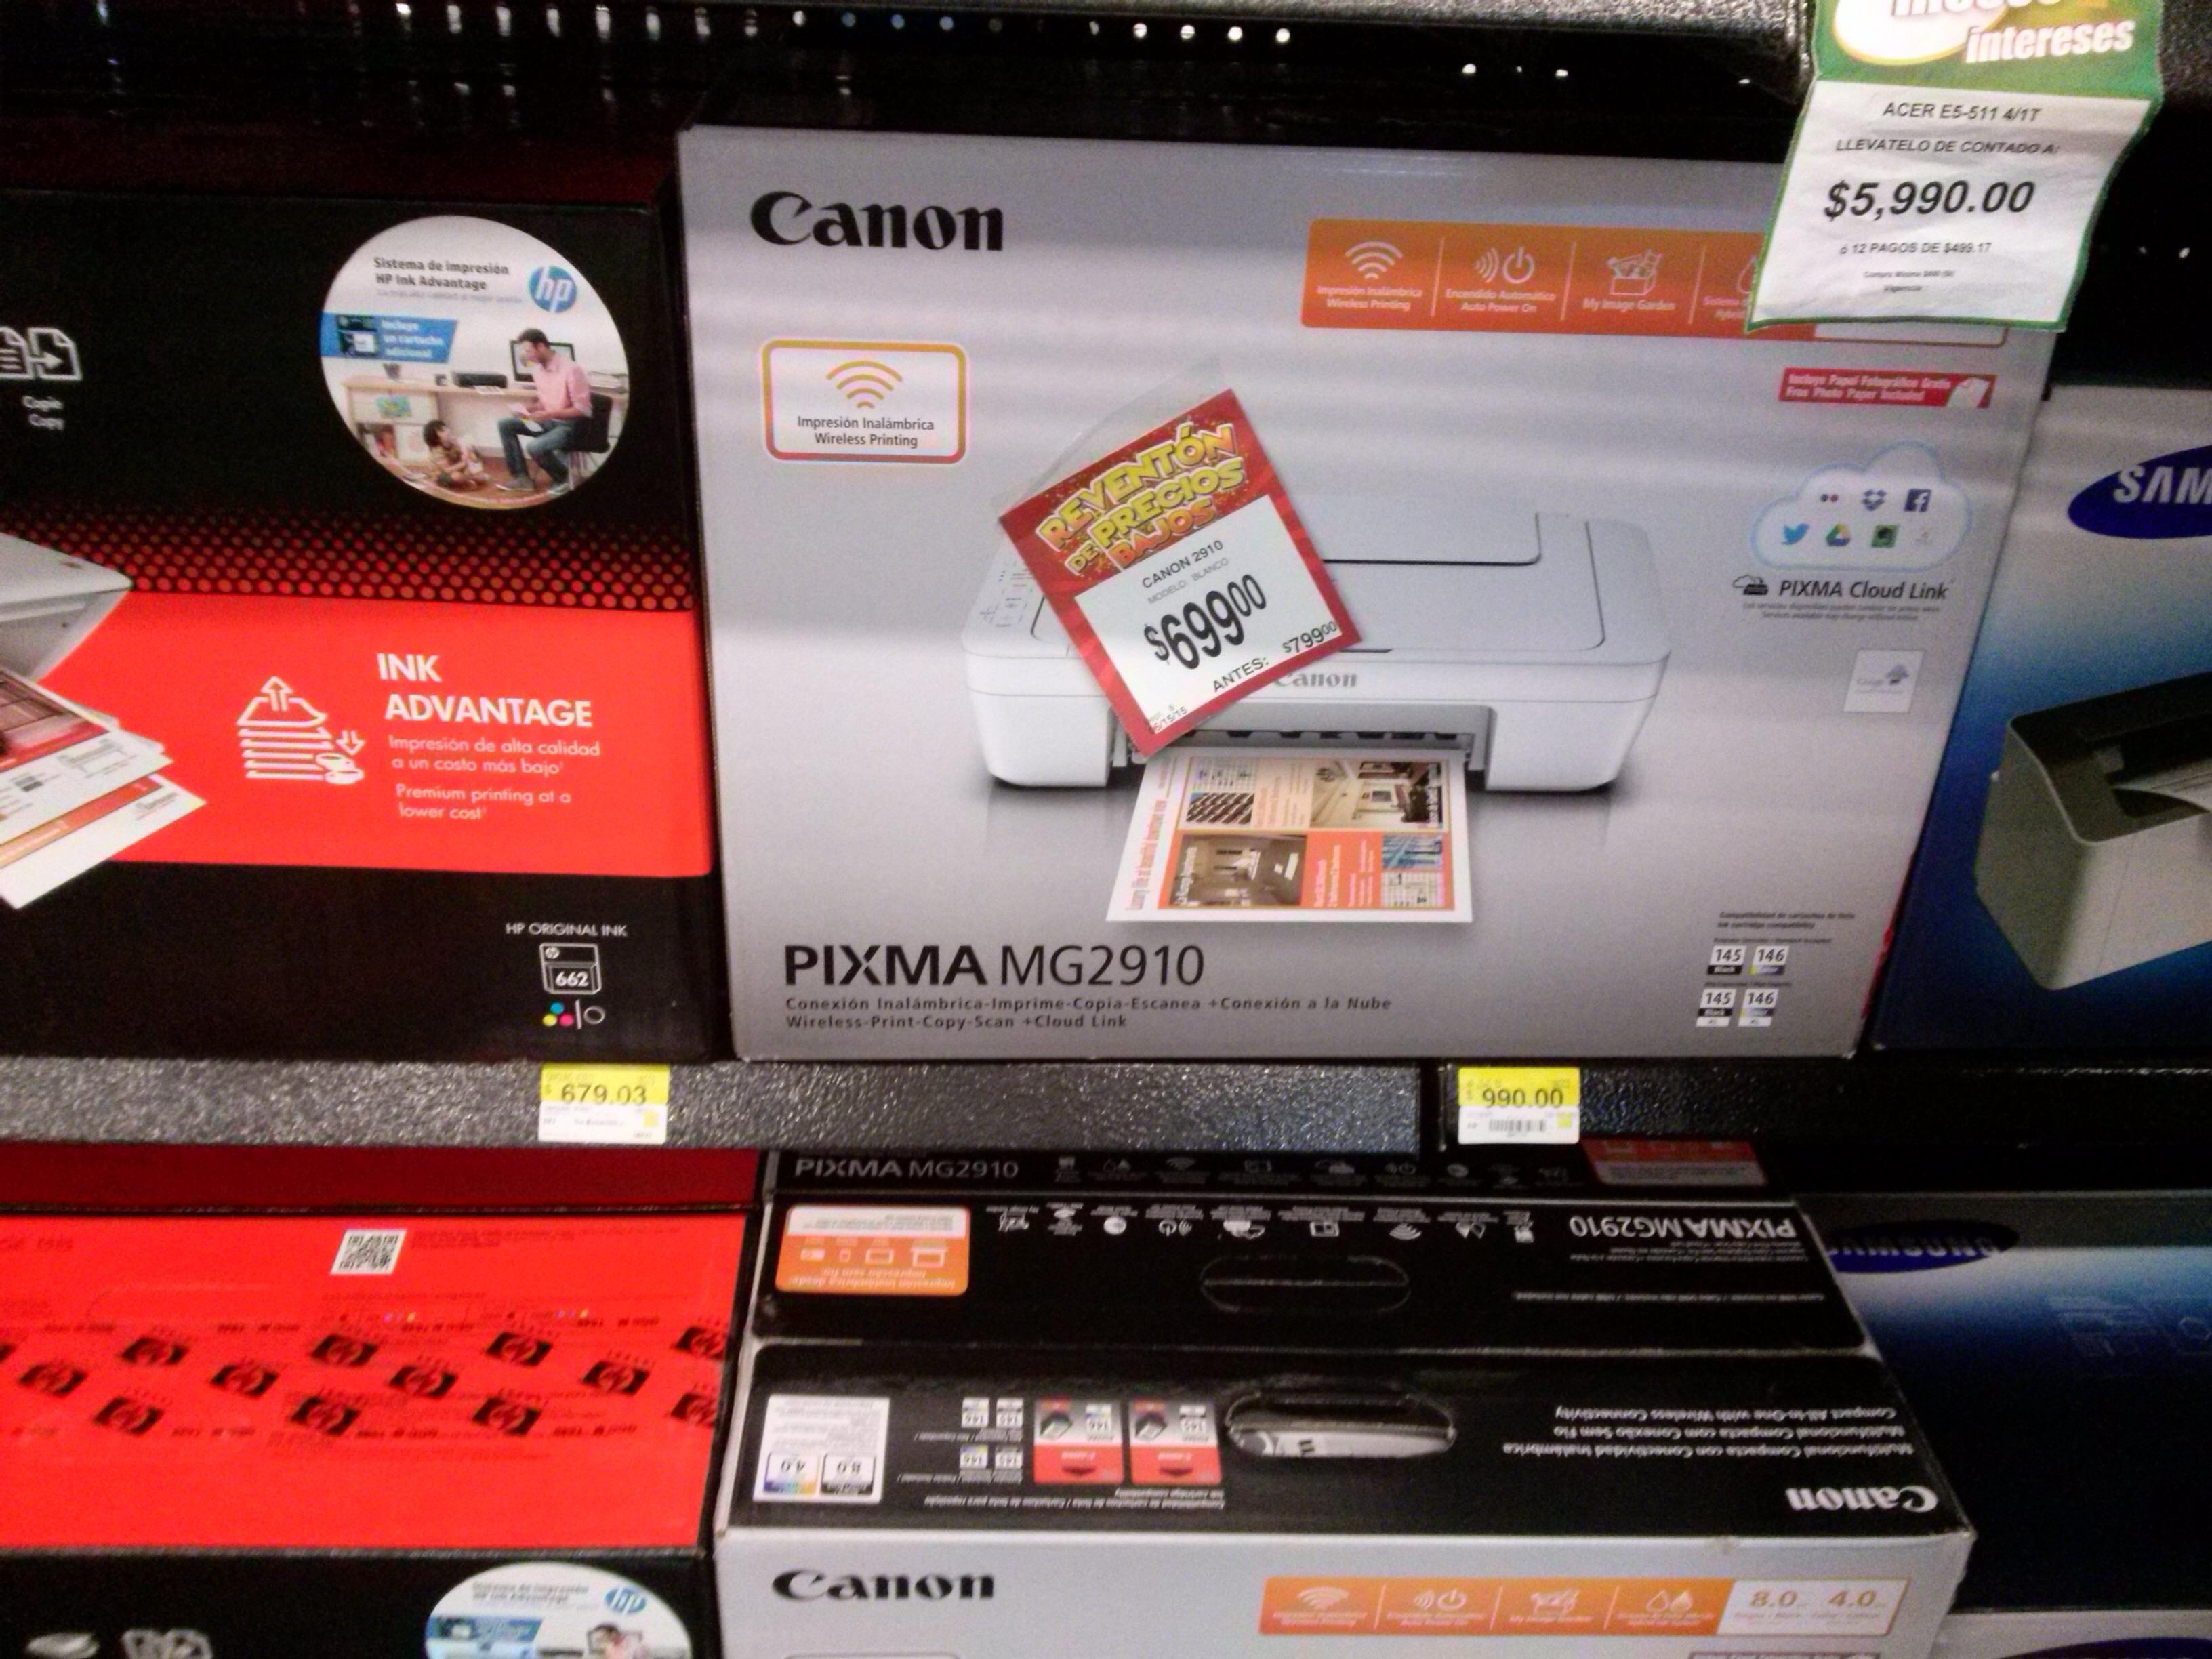 Bodega Aurrerá: multifuncional Canon MG2910 a $699